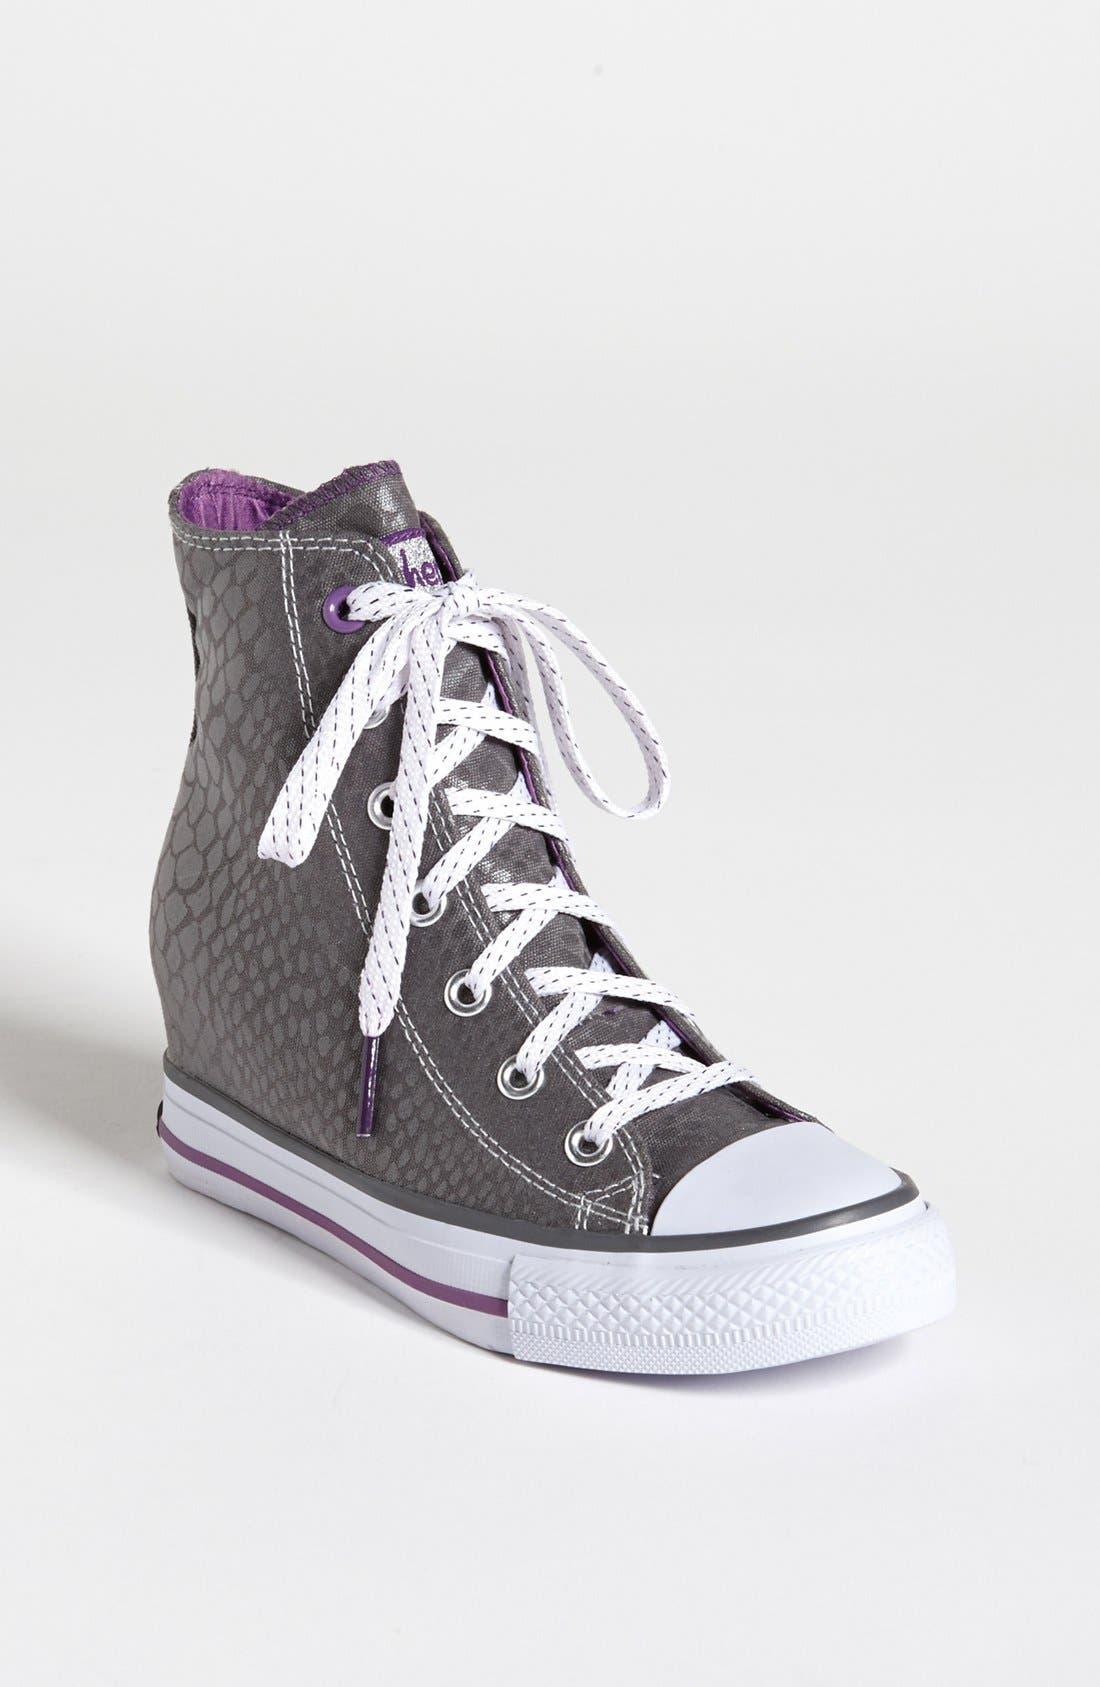 Alternate Image 1 Selected - SKECHERS 'Gimme Wedge' Sneaker (Toddler, Little Kid & Big Kid)